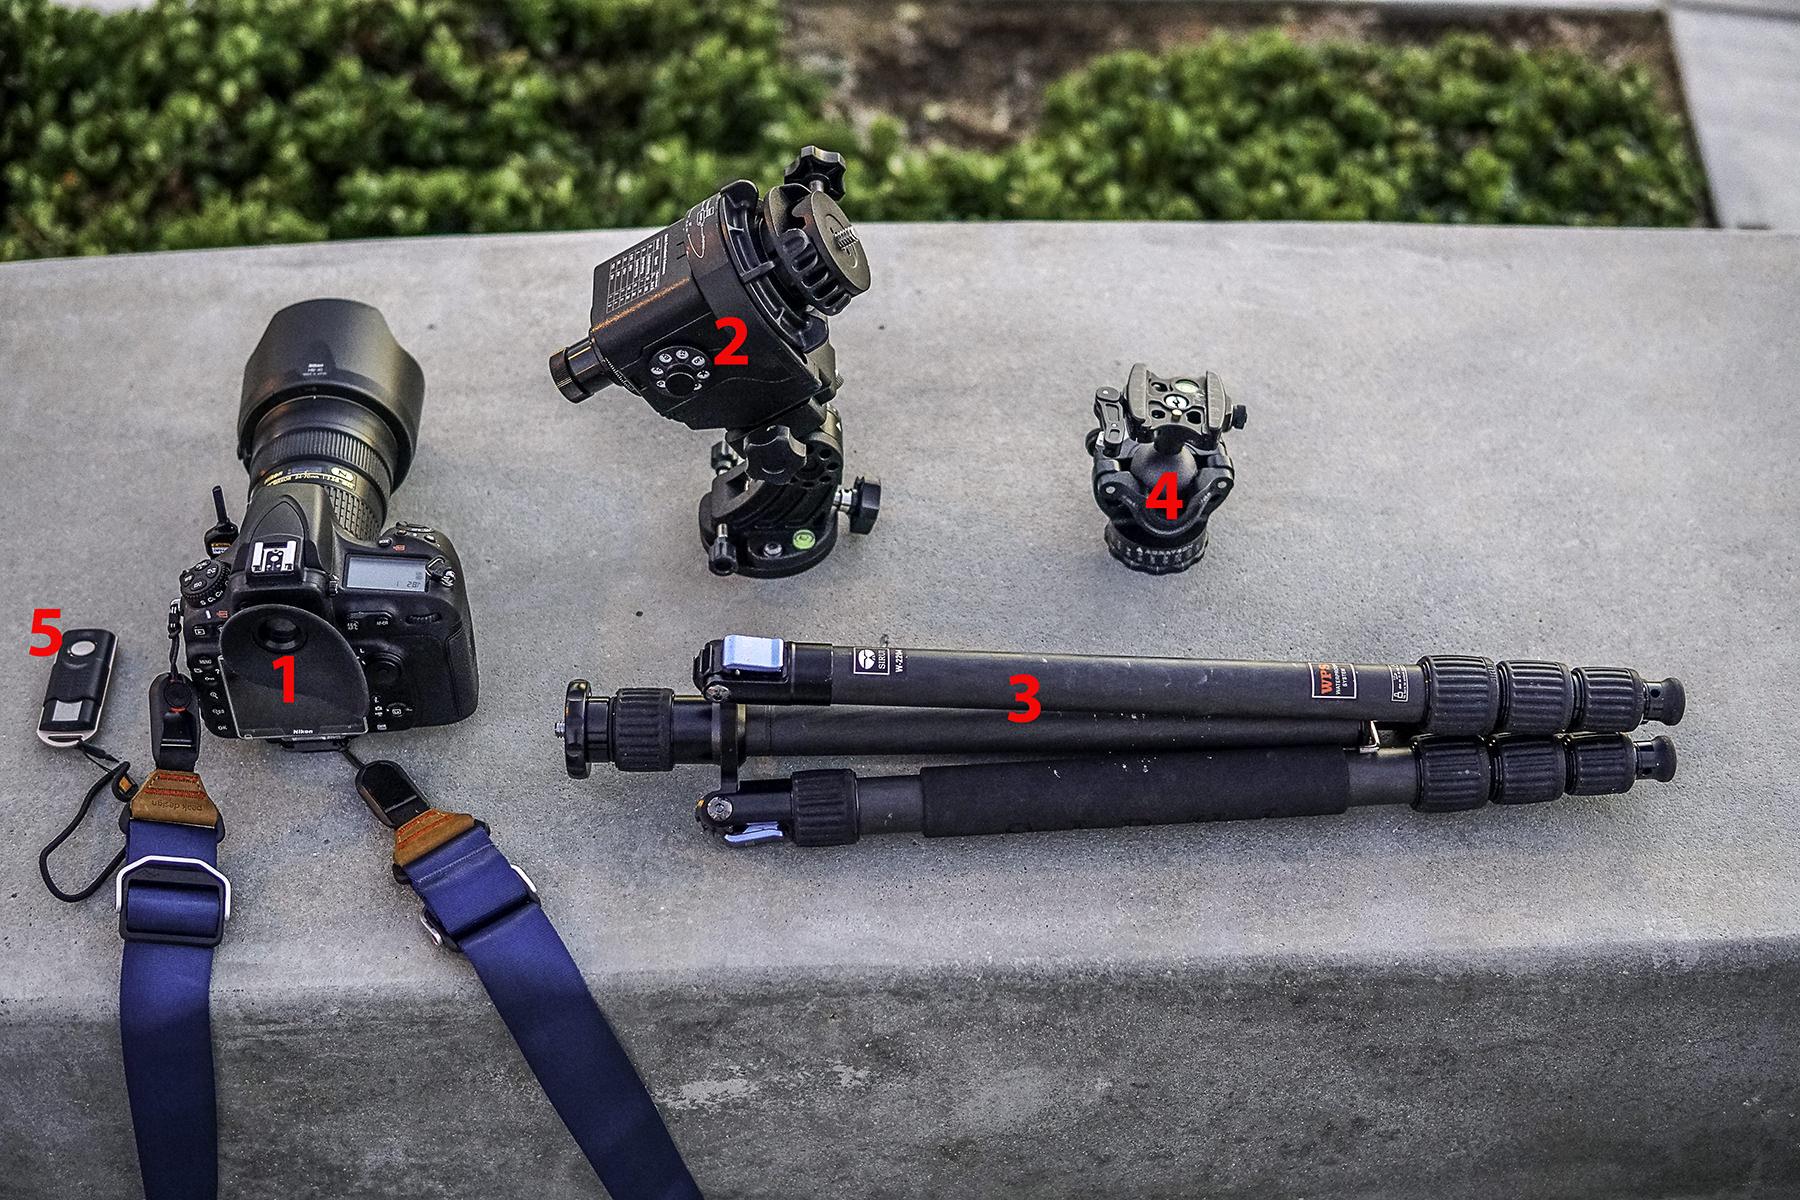 camera gear image  image